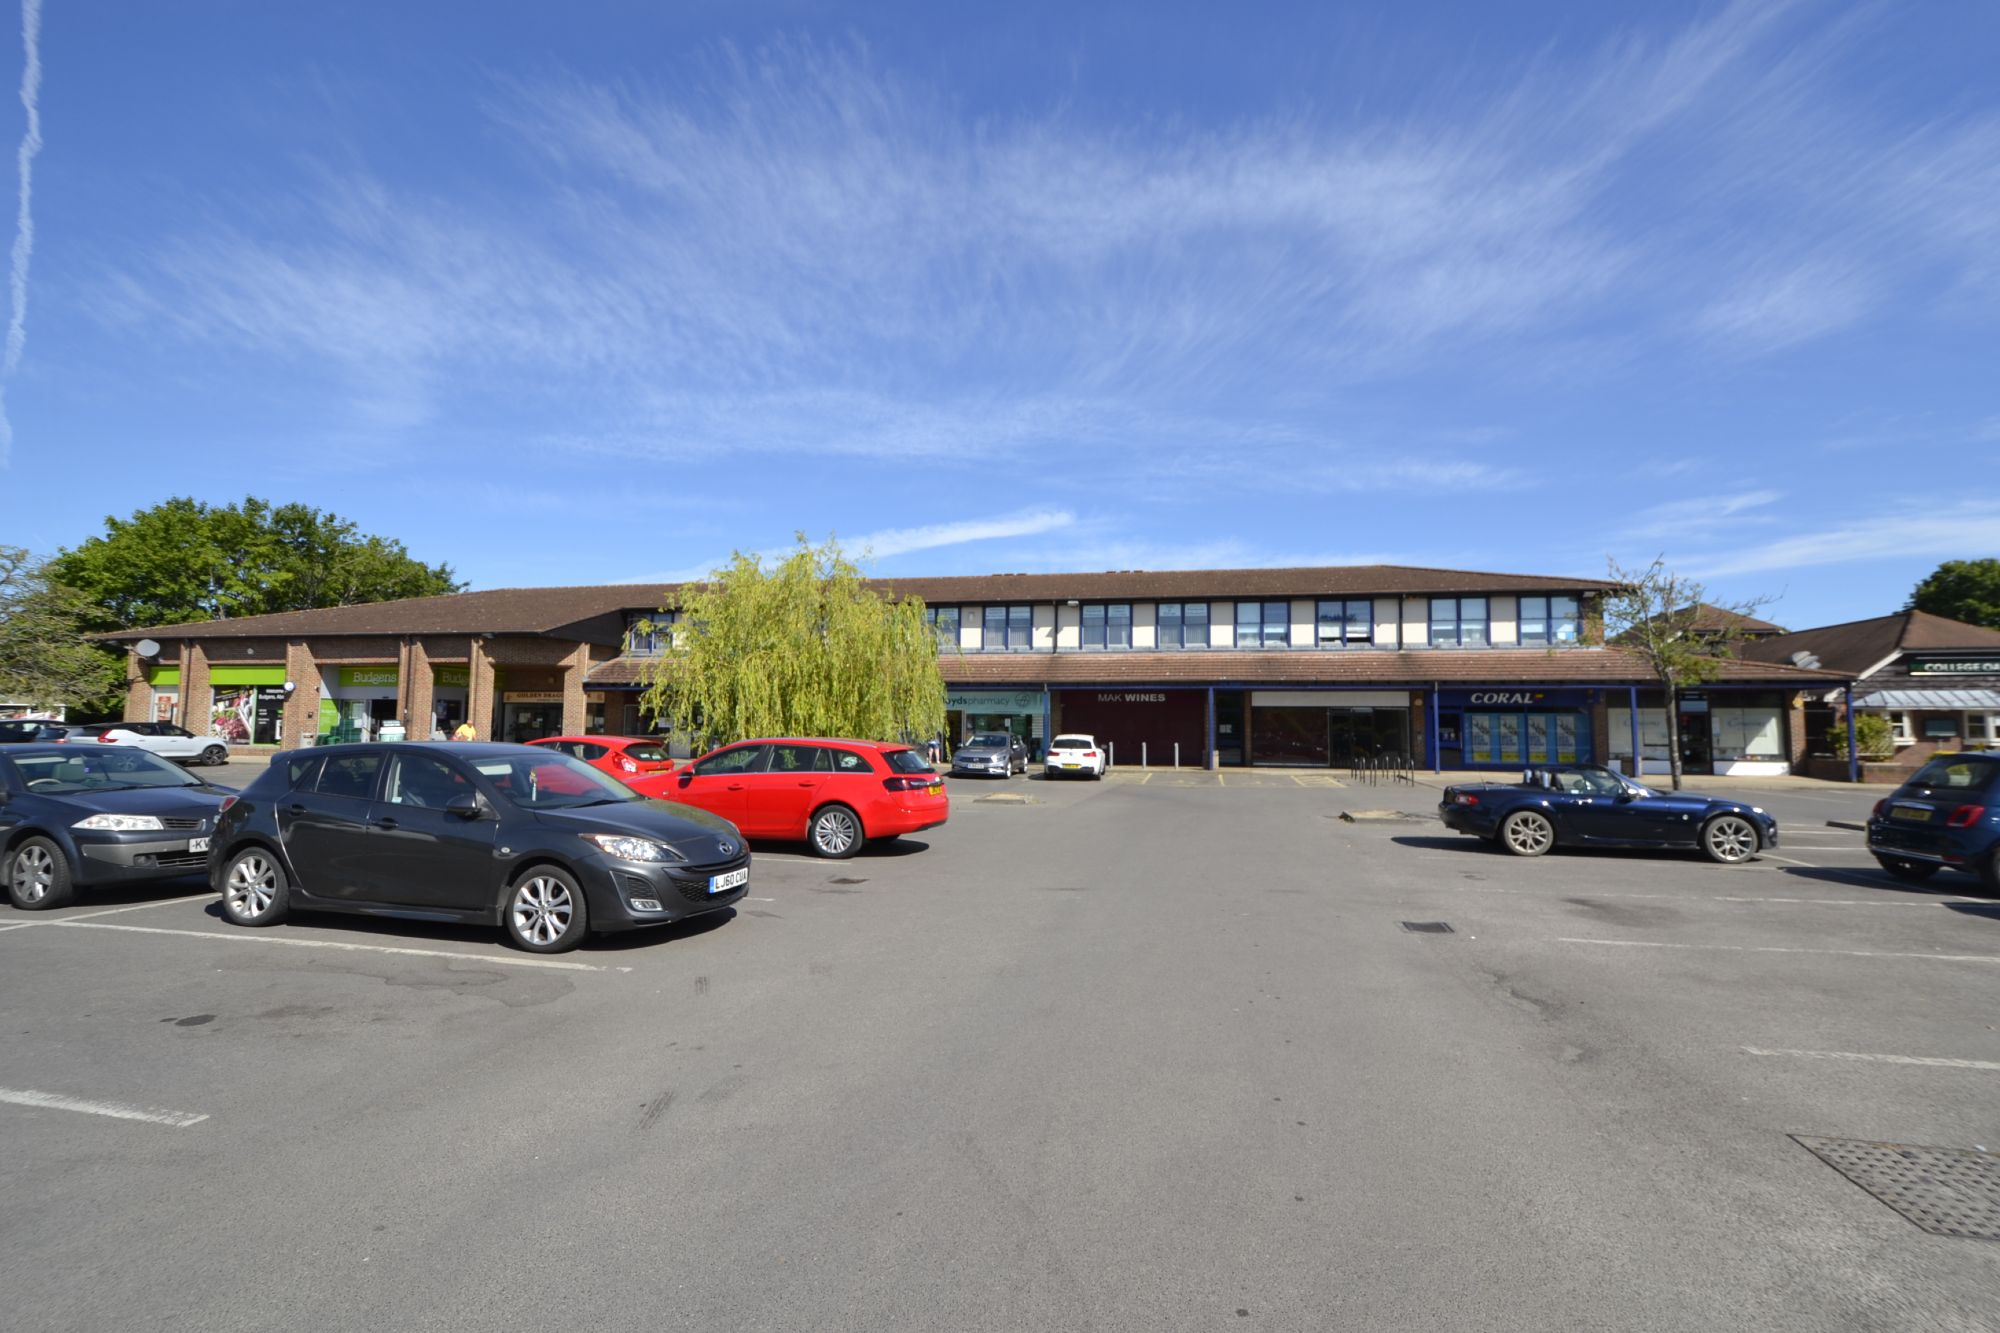 Similar property | 9 Peachcroft Shopping Centre - Abingdon